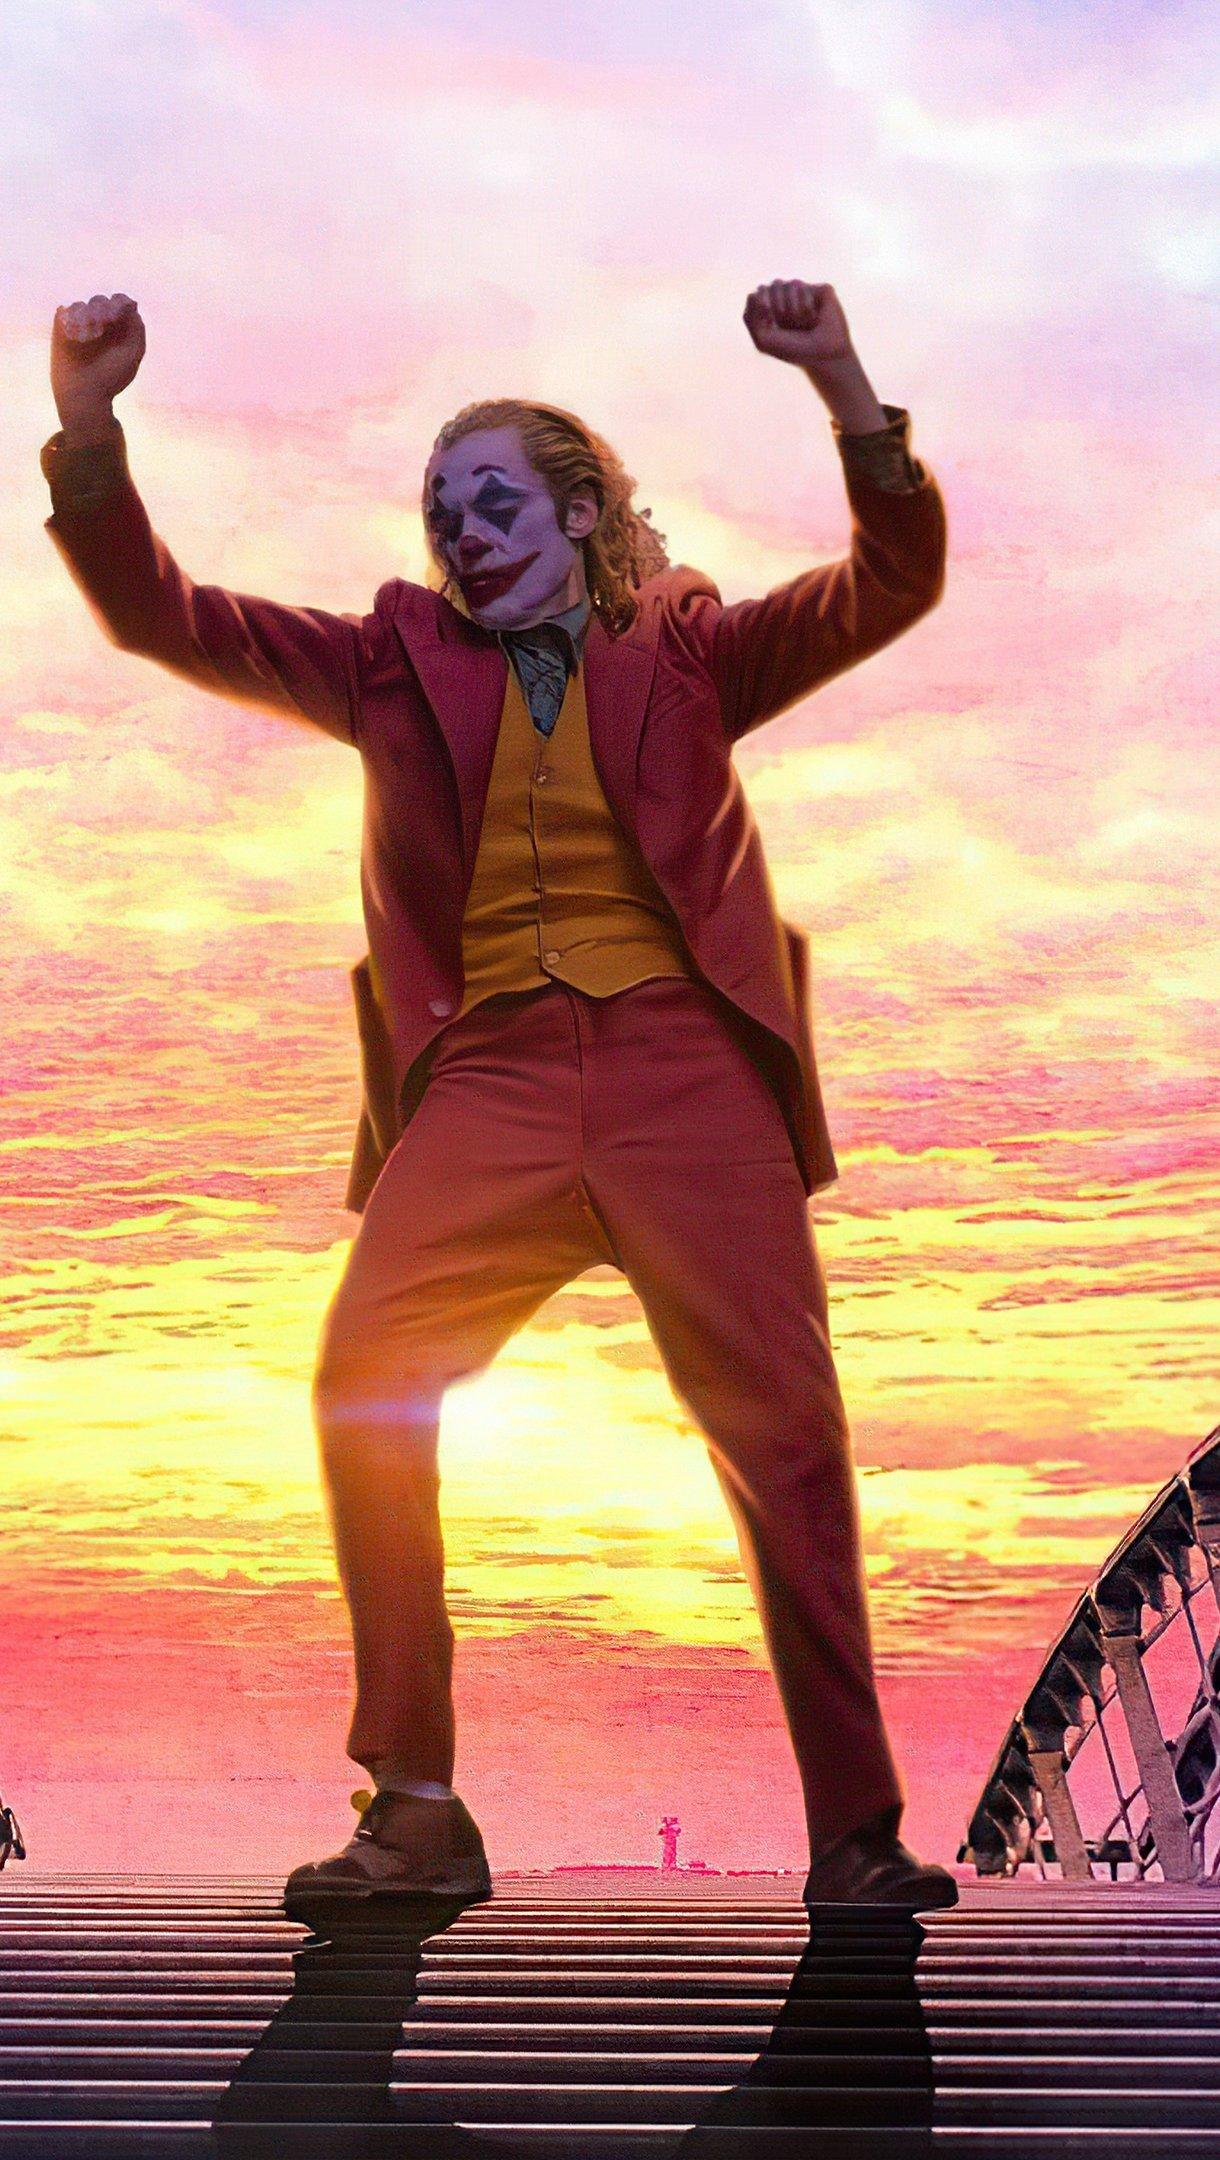 Wallpaper Joker dancing in the stairs Vertical